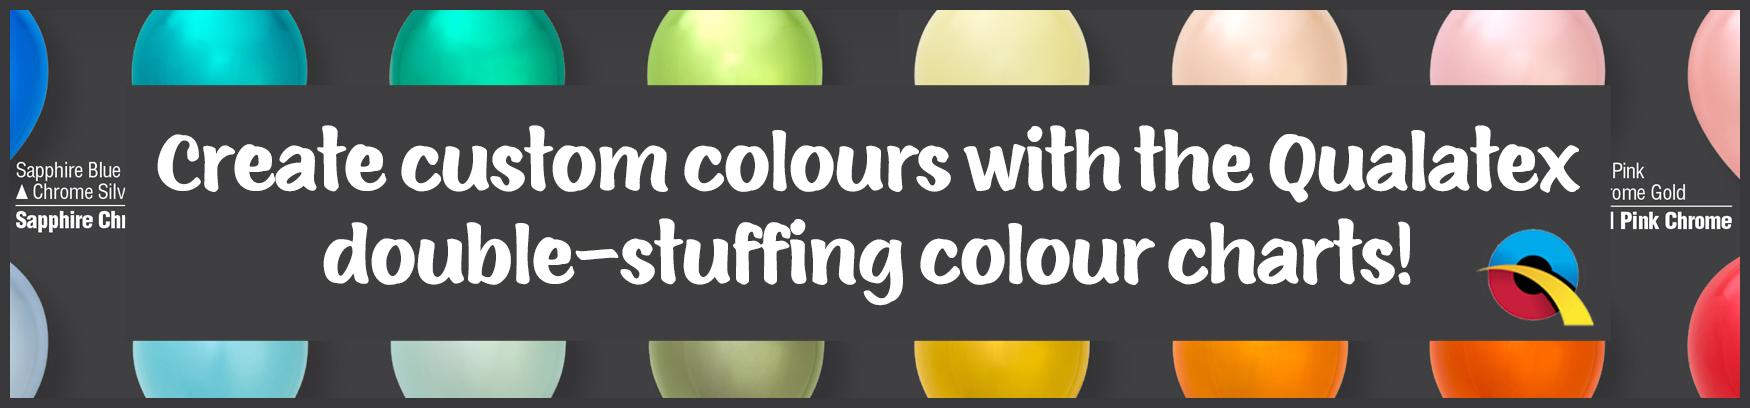 Custom Colour Chart image